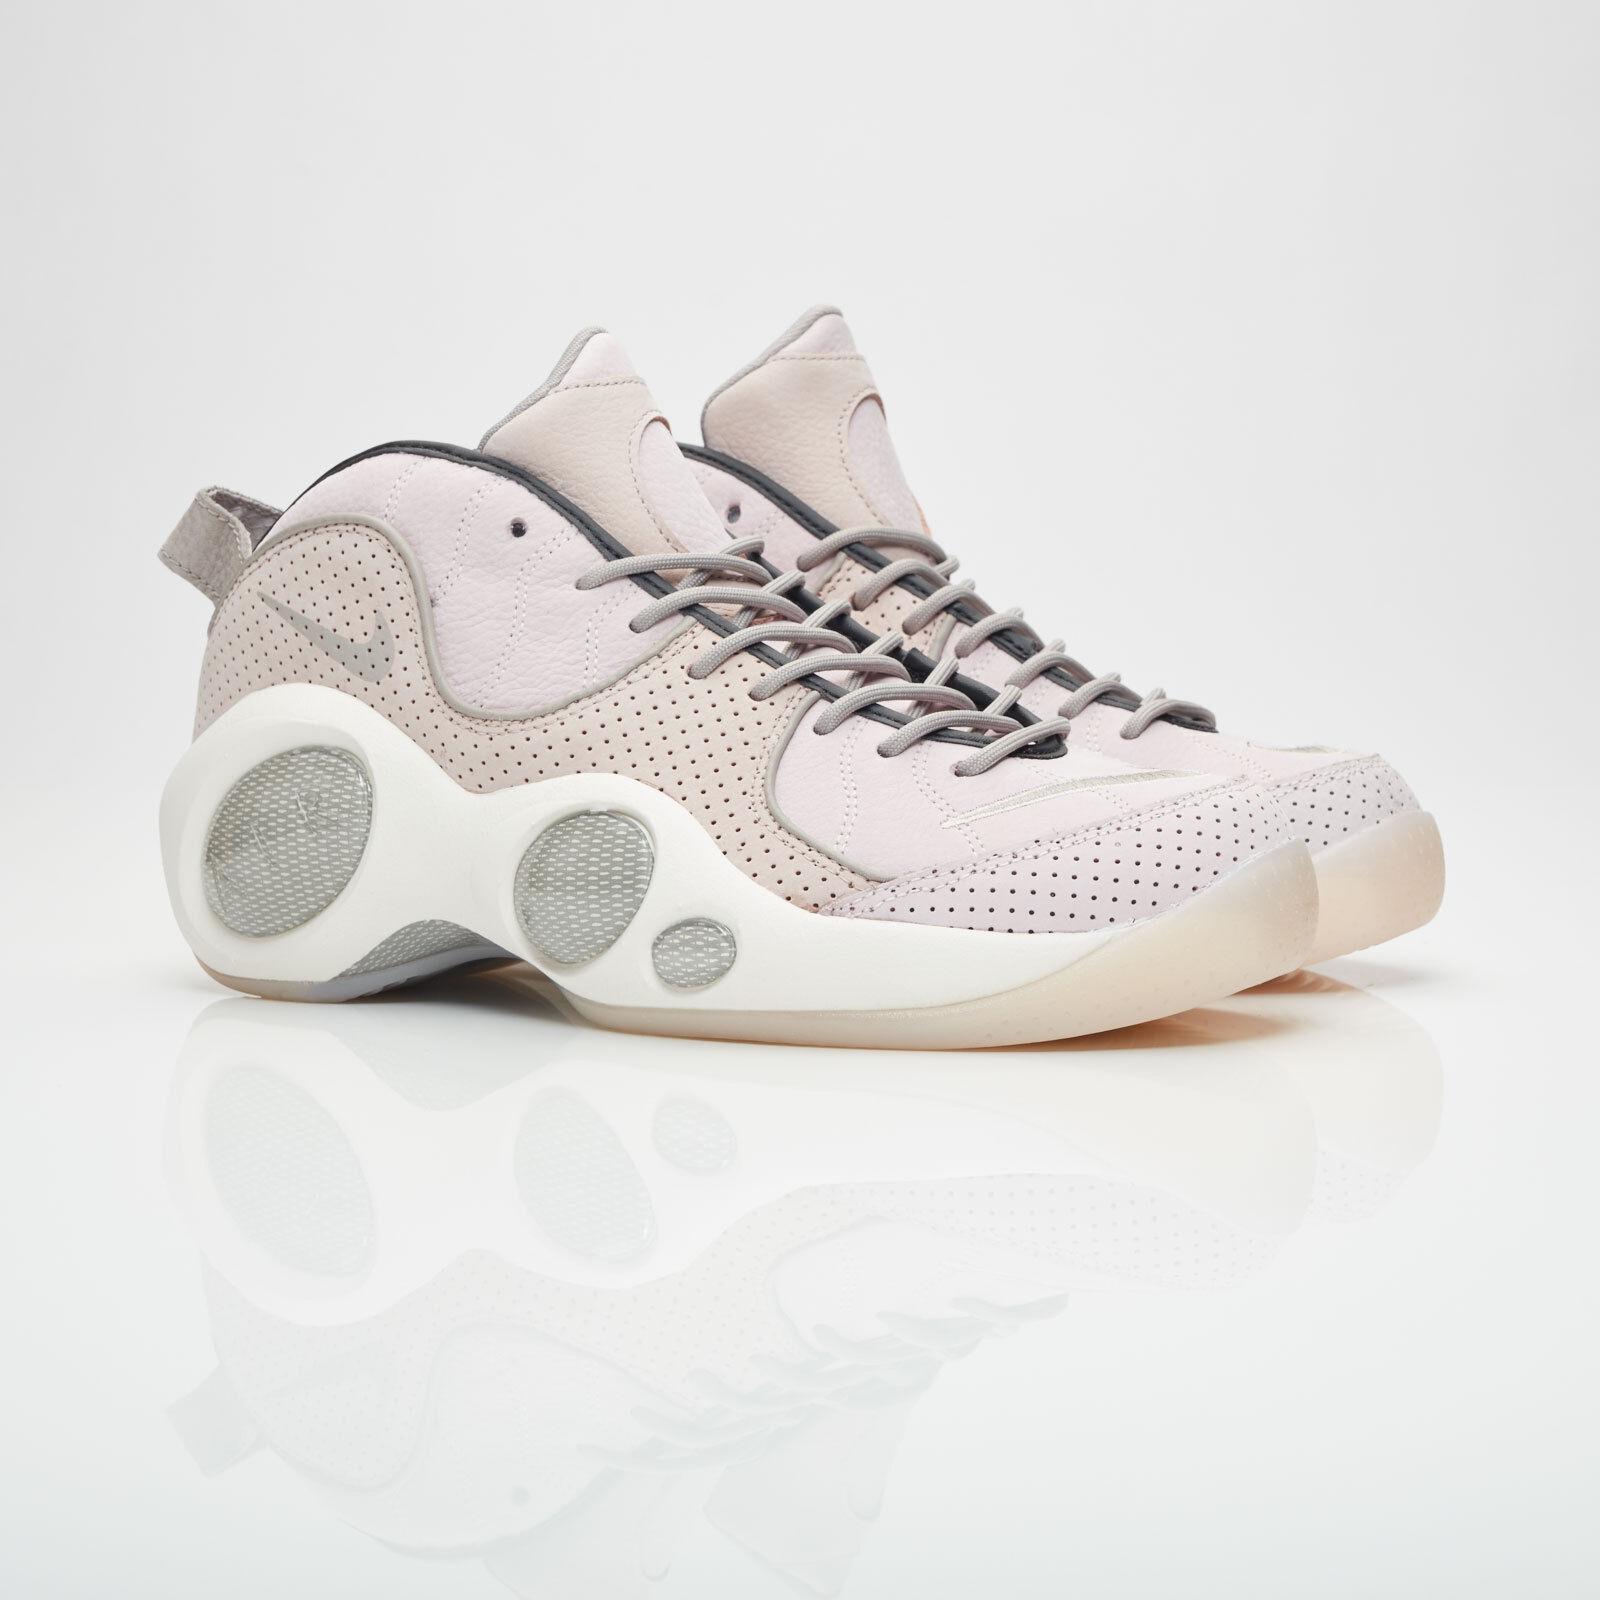 BNIB MENS  Nike NikeLab  Zoom Flight 95 UK UK UK 8 100% Authentics 941943 600 7d6900